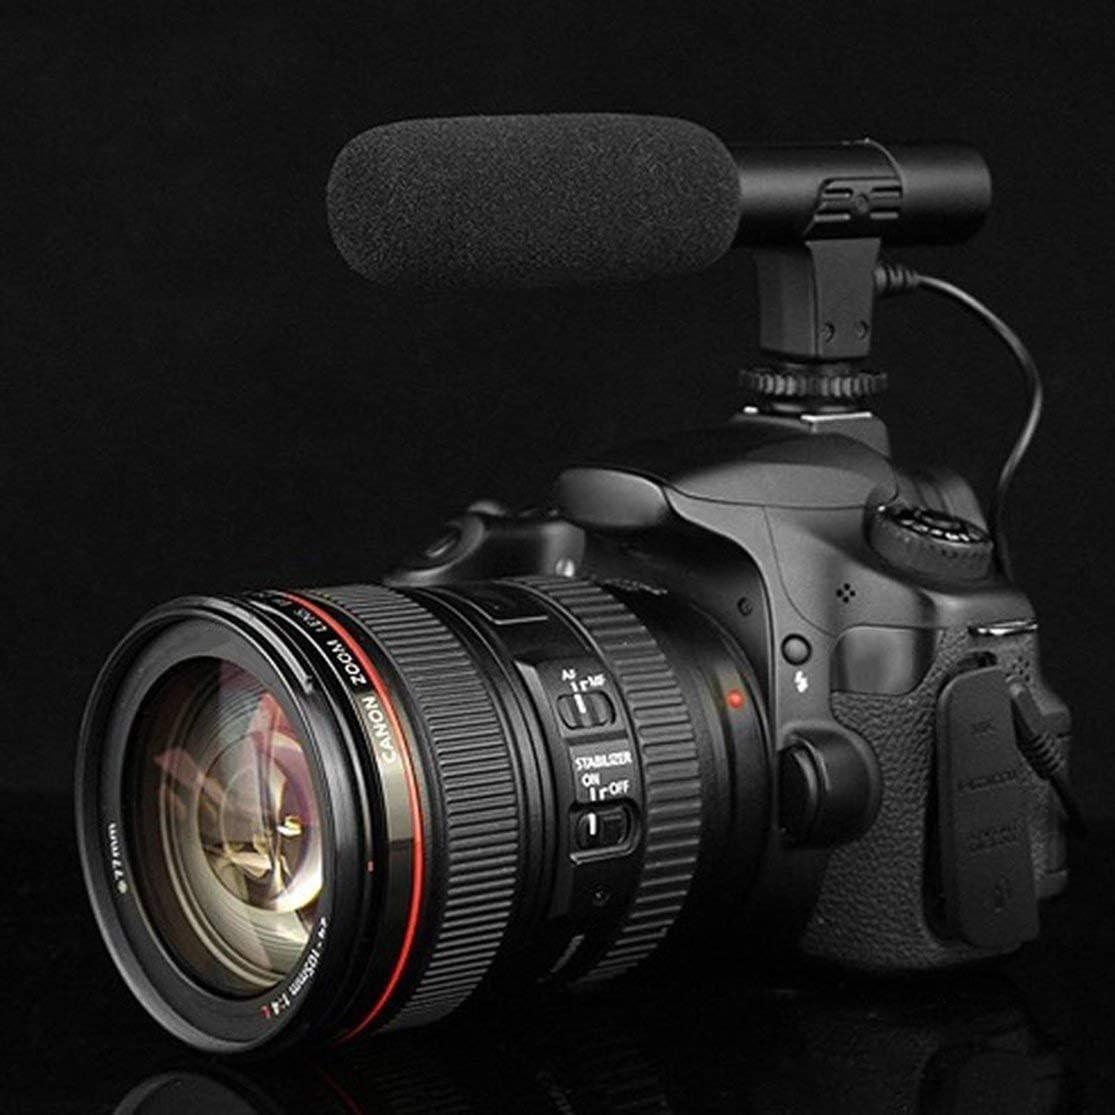 EH-32 Power Adapter PremiumDigital Compatible With Nikon EH-30 EH-31